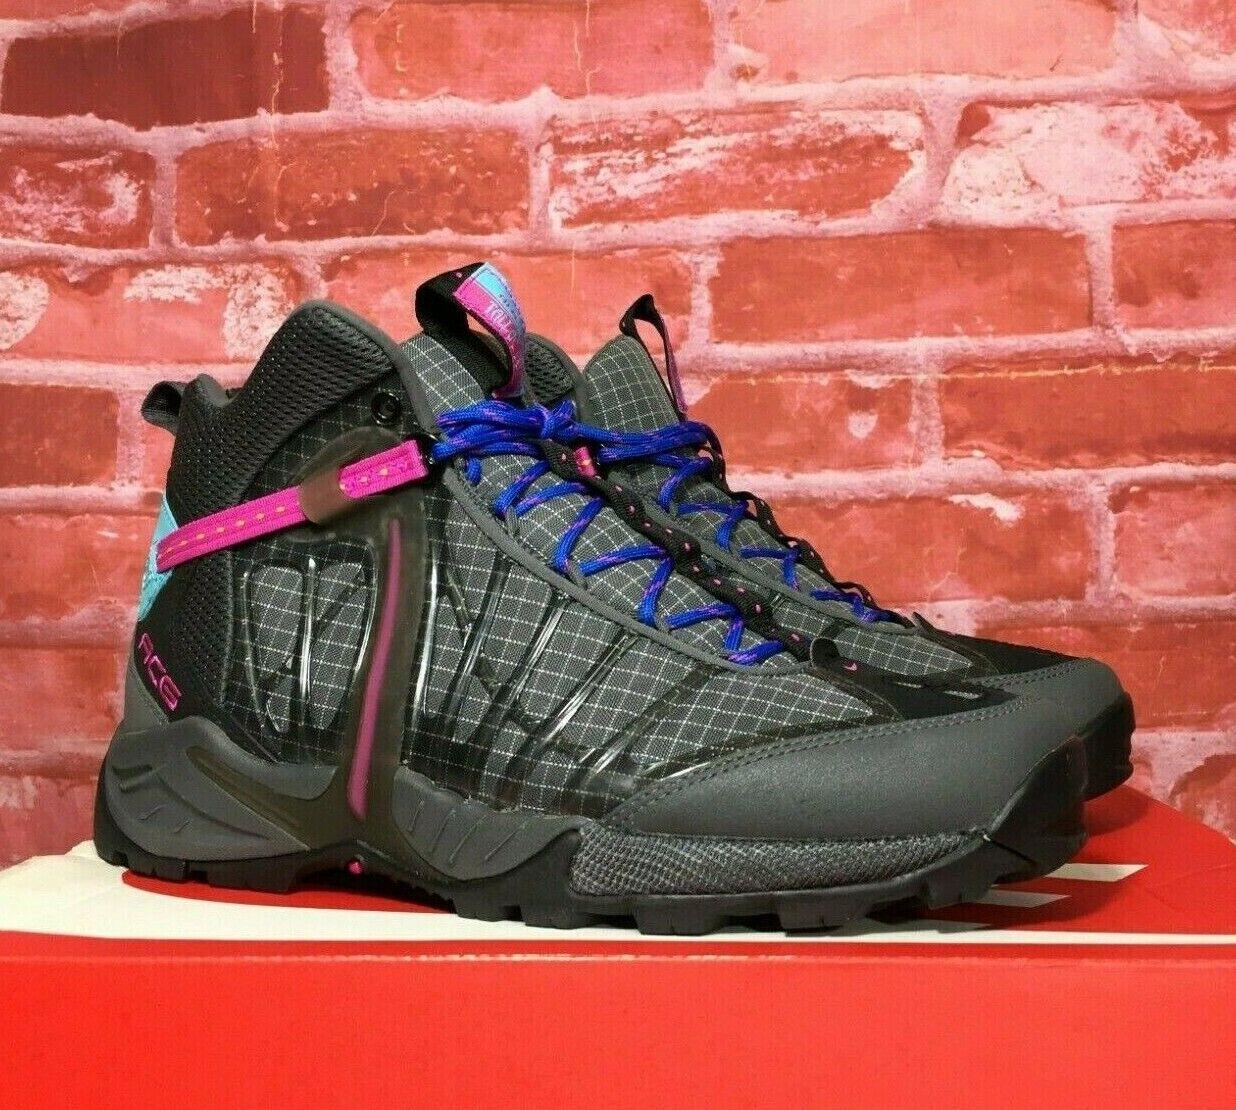 ligeramente dos leyendo  Nike Air Zoom Tallac Lite OG ACG Sneaker BOOTS Men US Size 9 . for sale  online   eBay